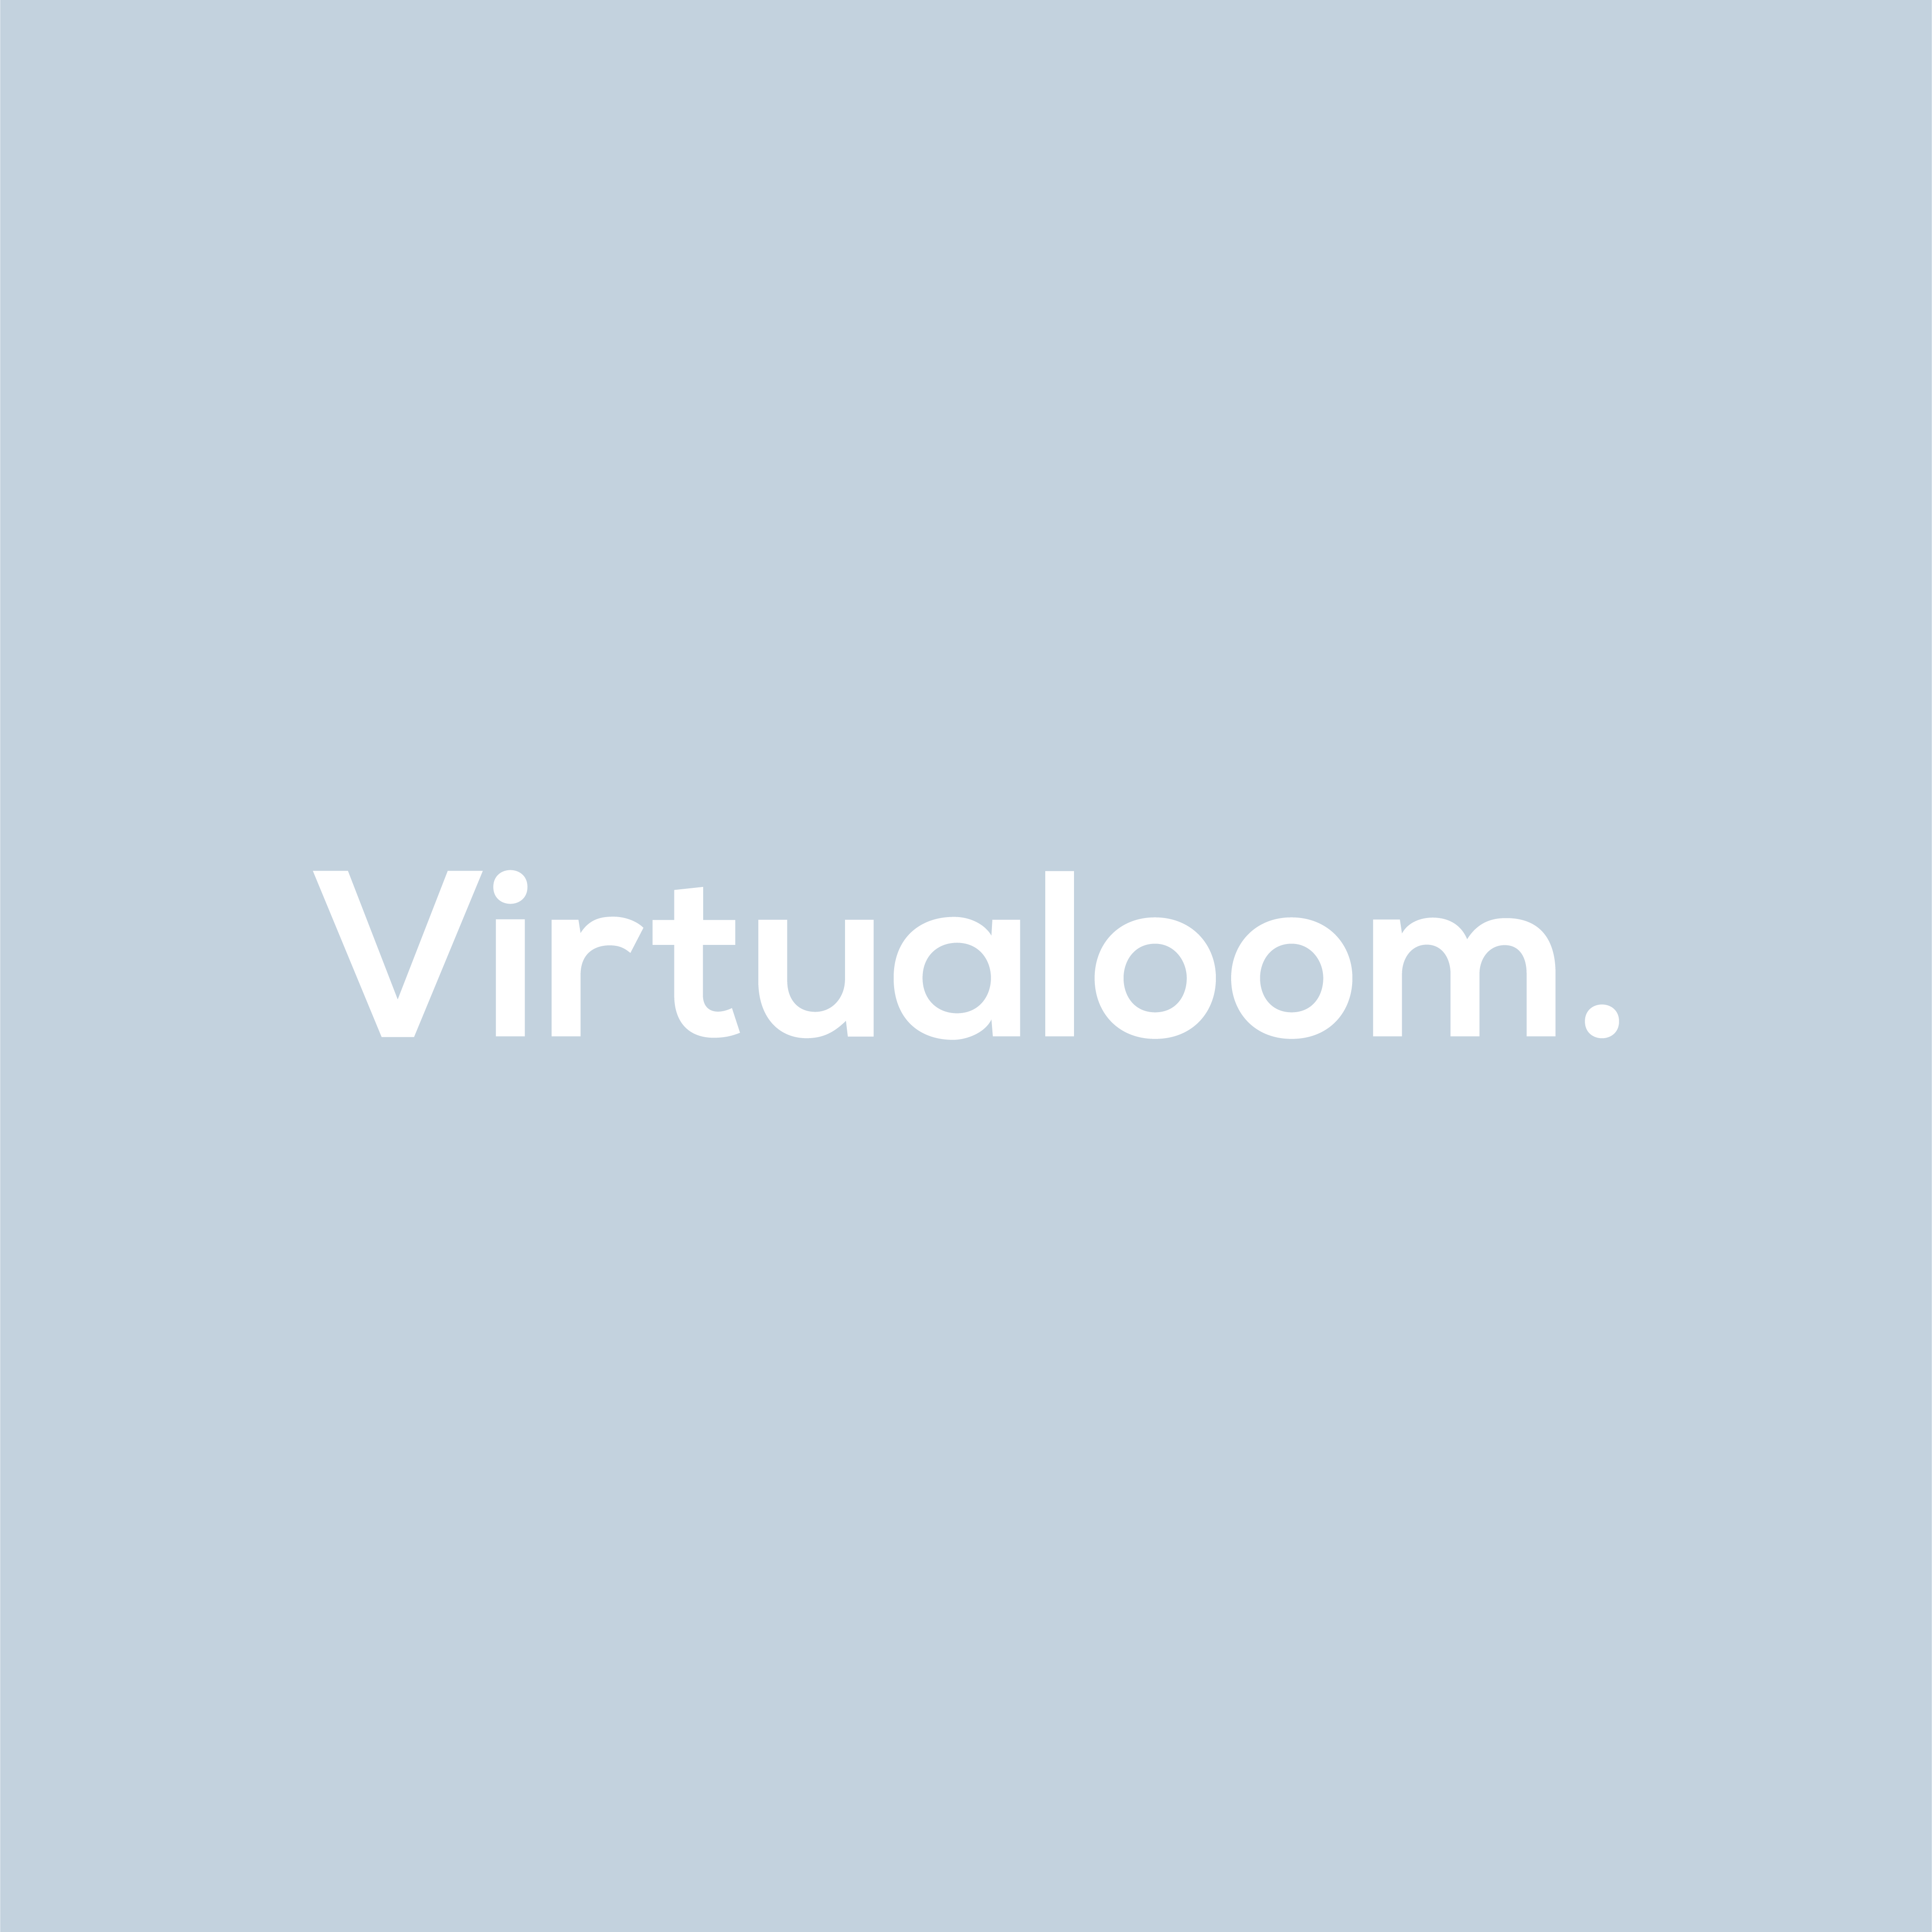 Virtualoom